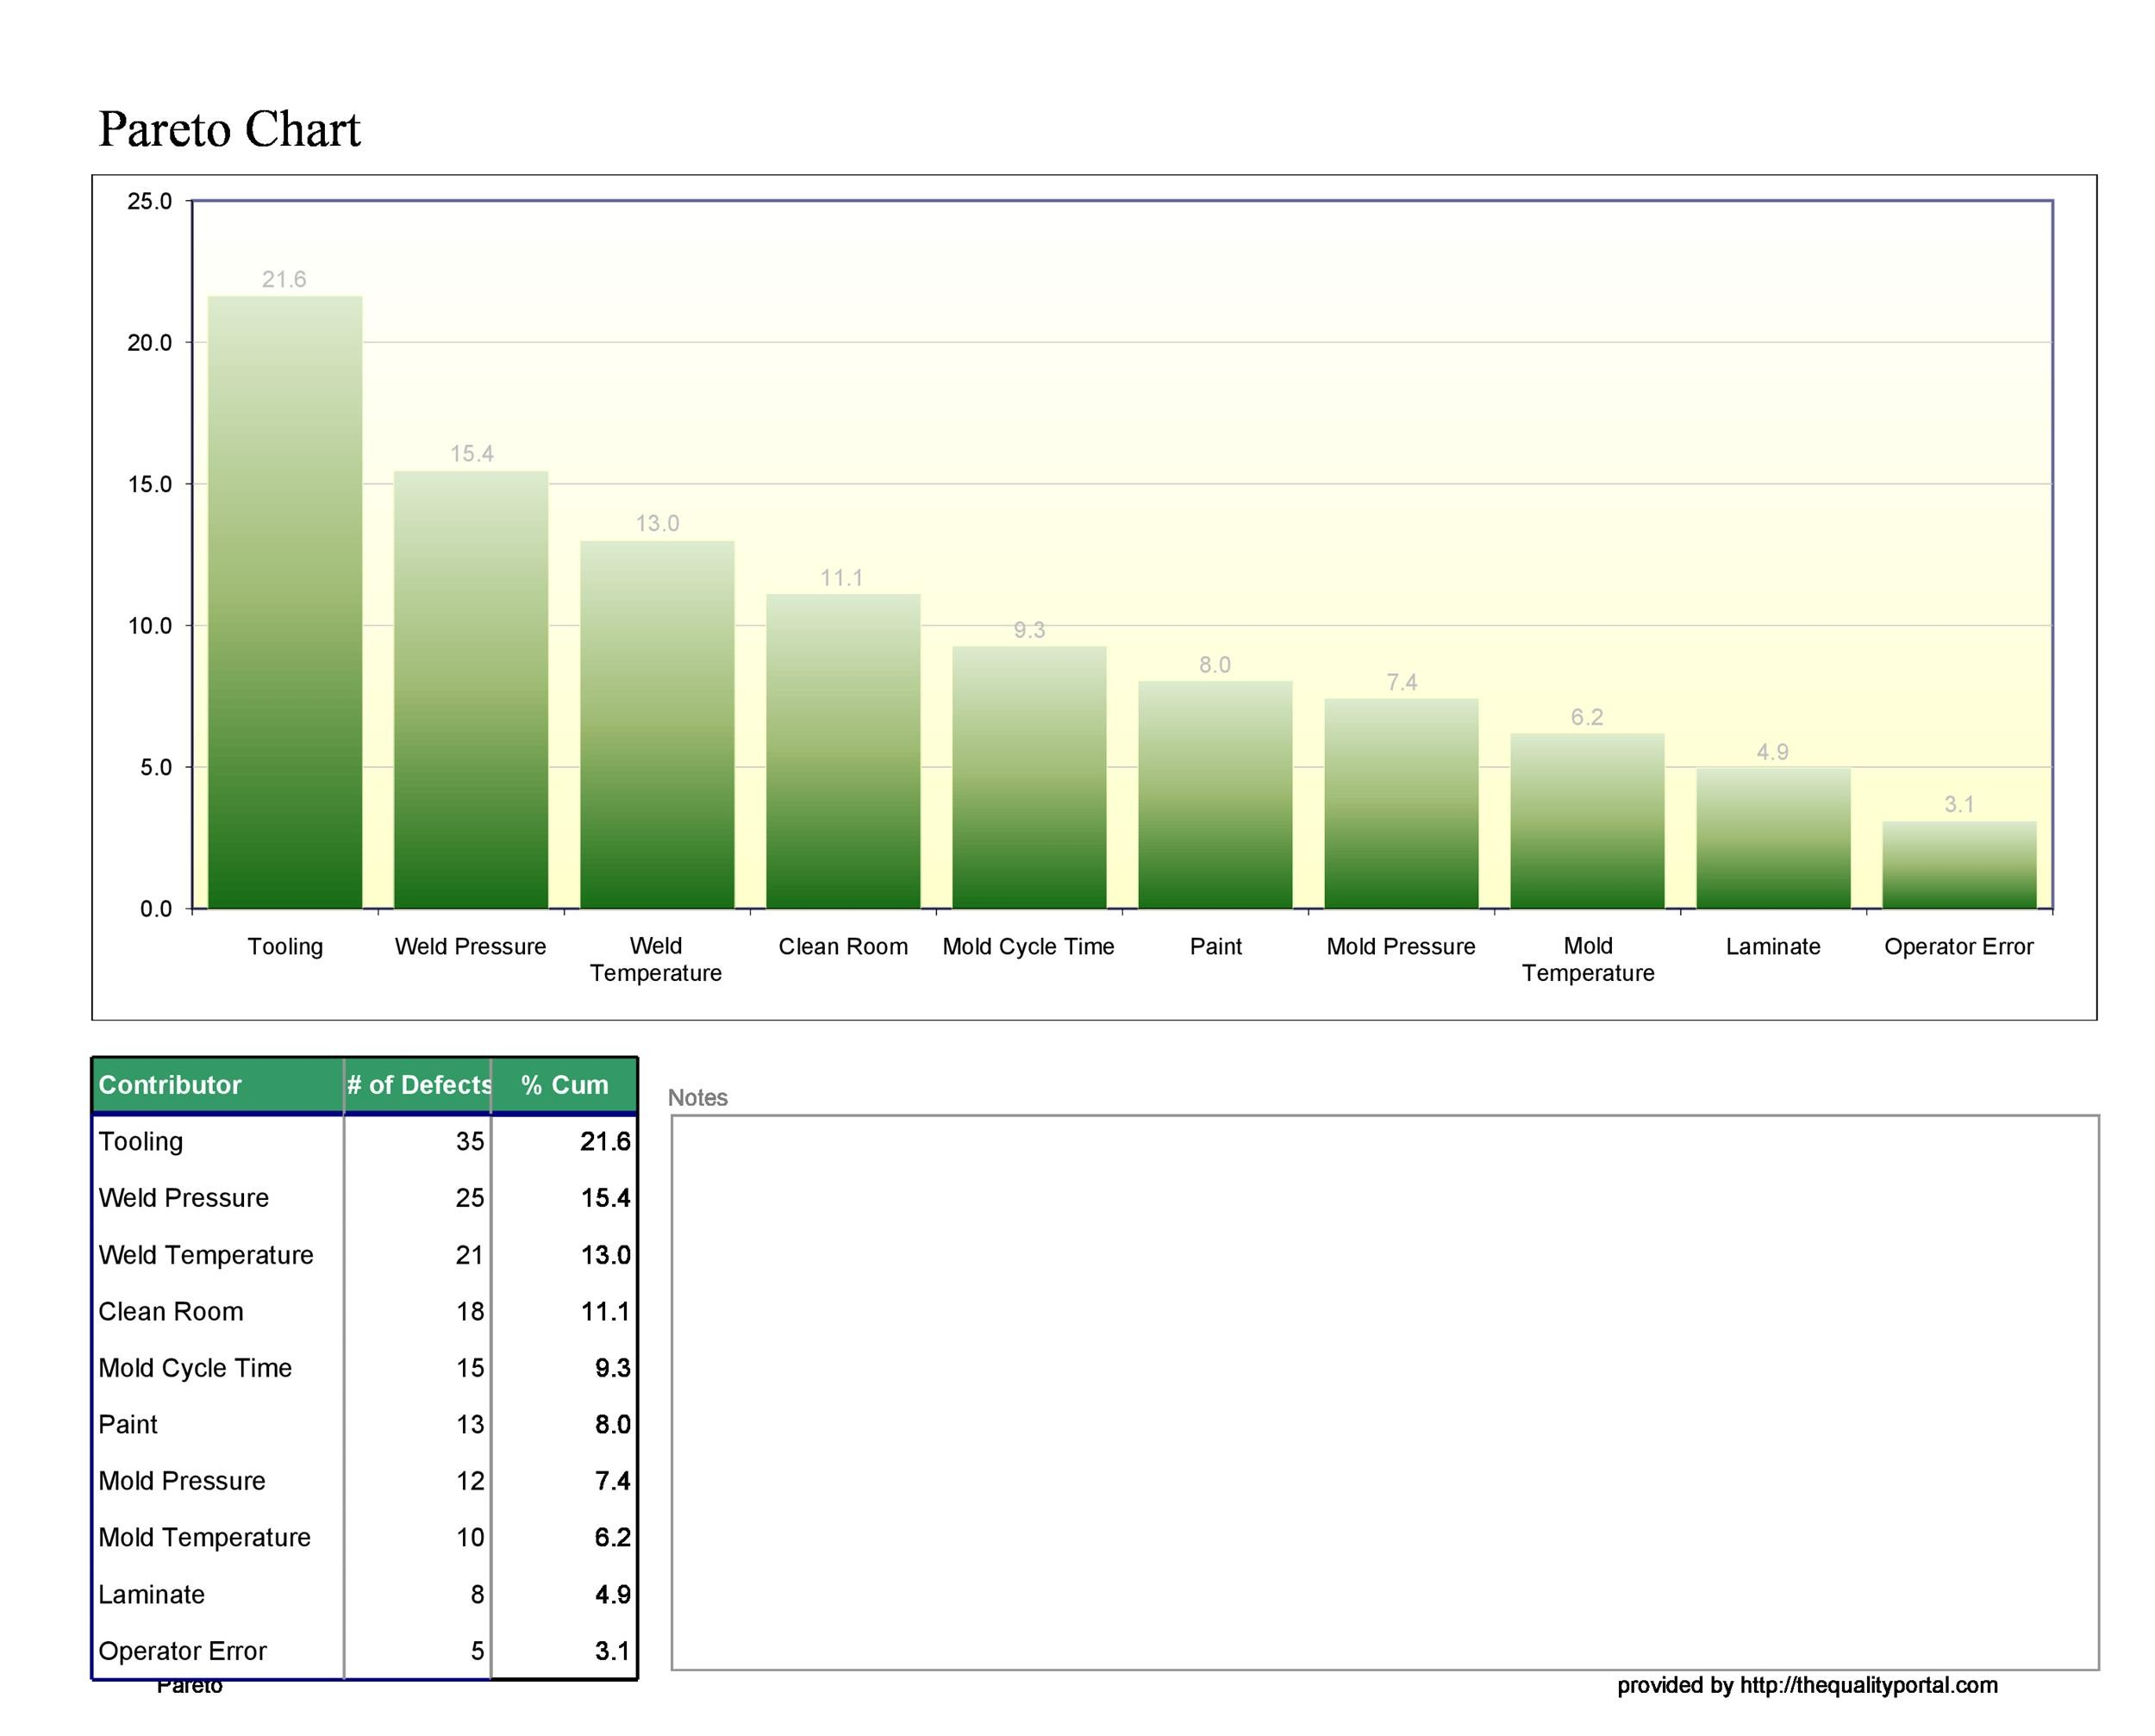 Free Pareto Chart 03